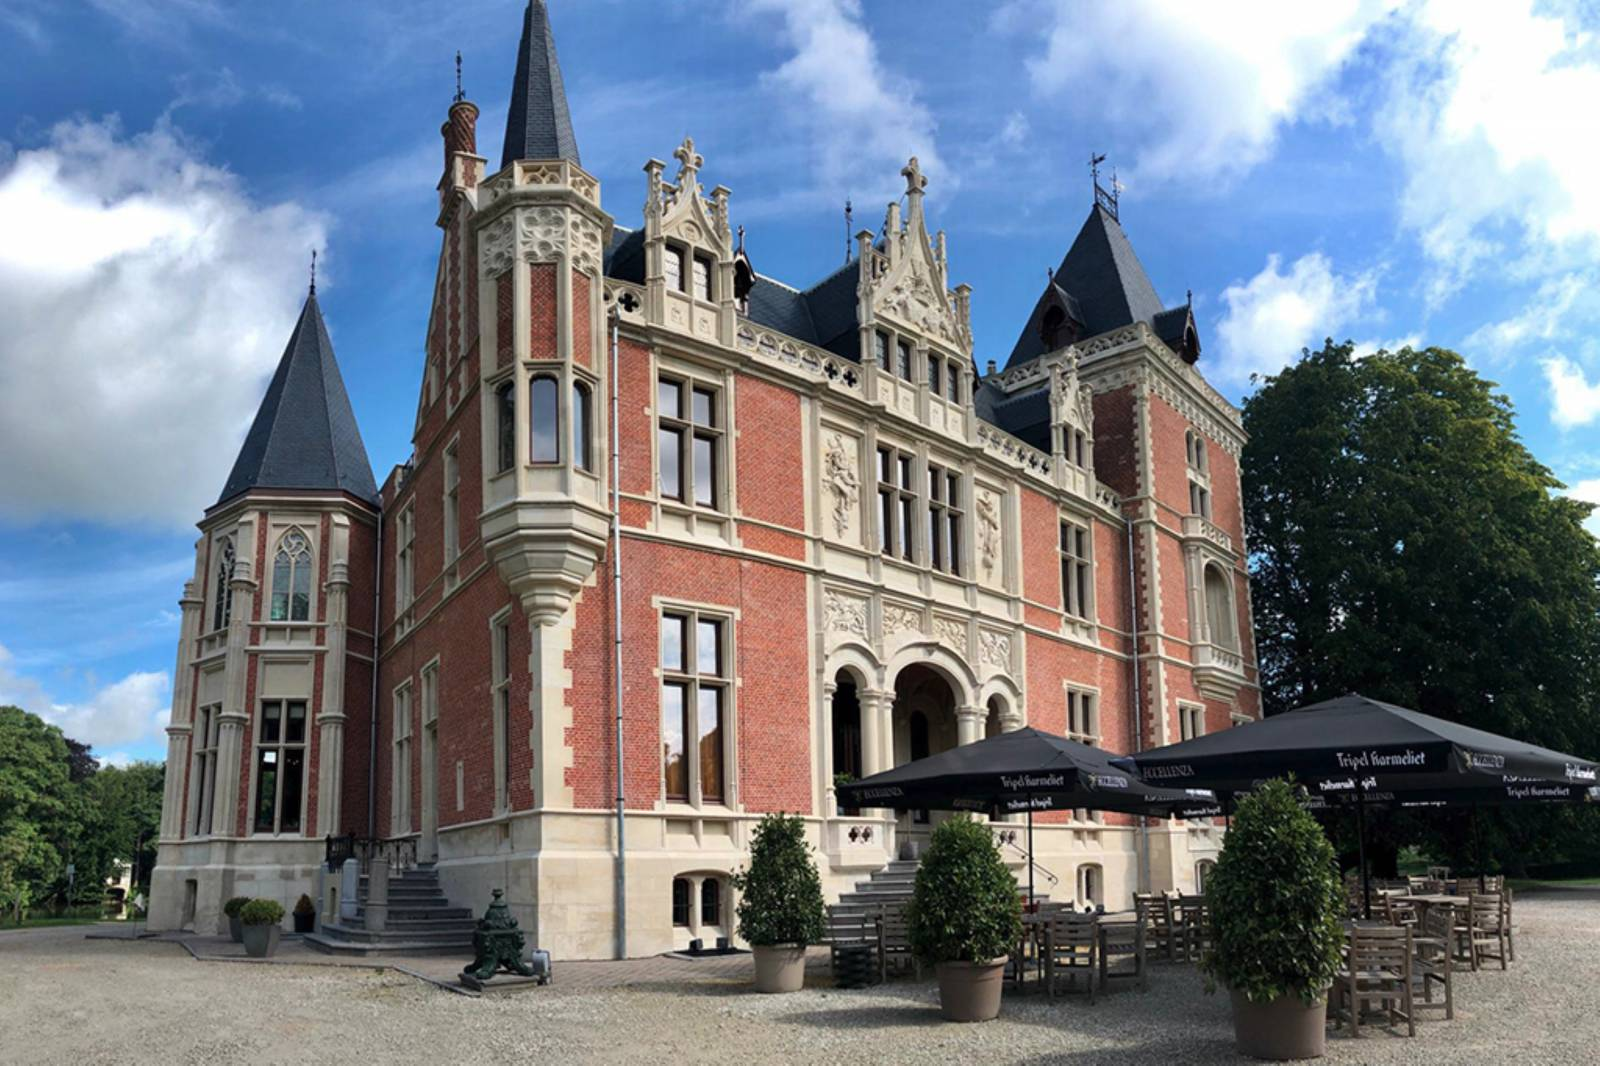 Kasteel D'artrycke - Feestzaal - House of Weddings (5)